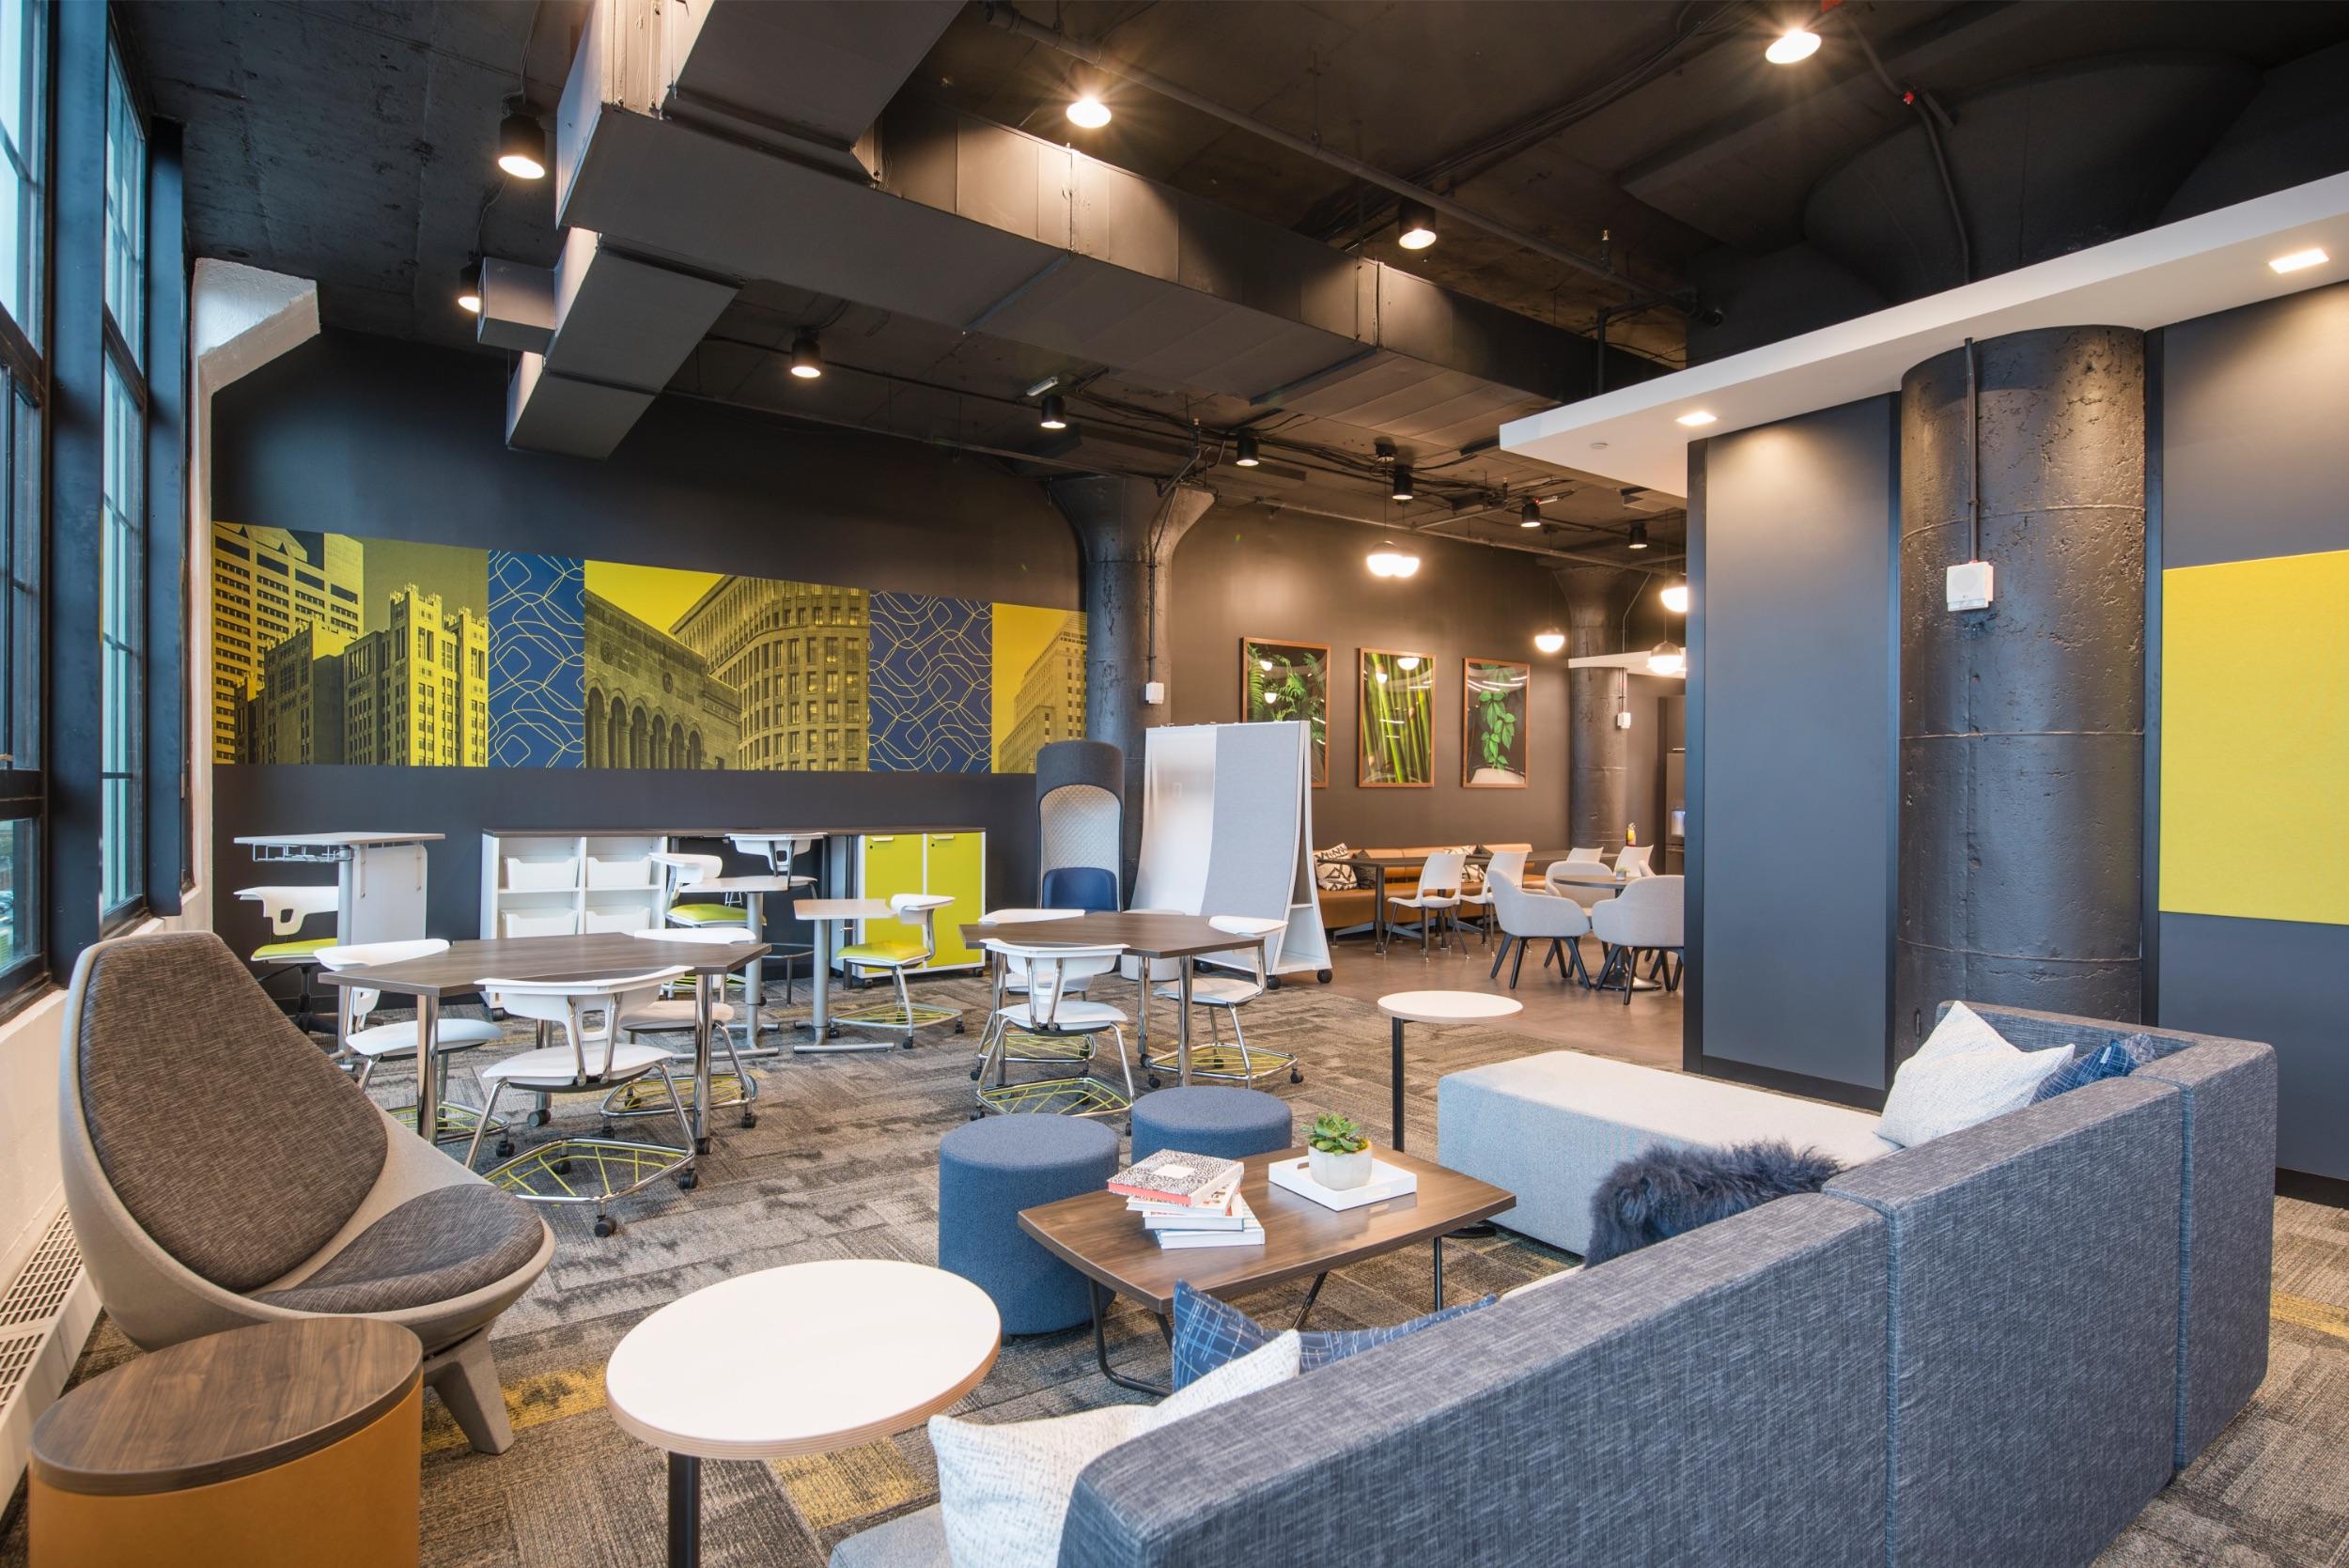 Corderman_Construction_KI_Showroom_Boston_Design_Center_Open_Area_Furniture_Layout.jpg